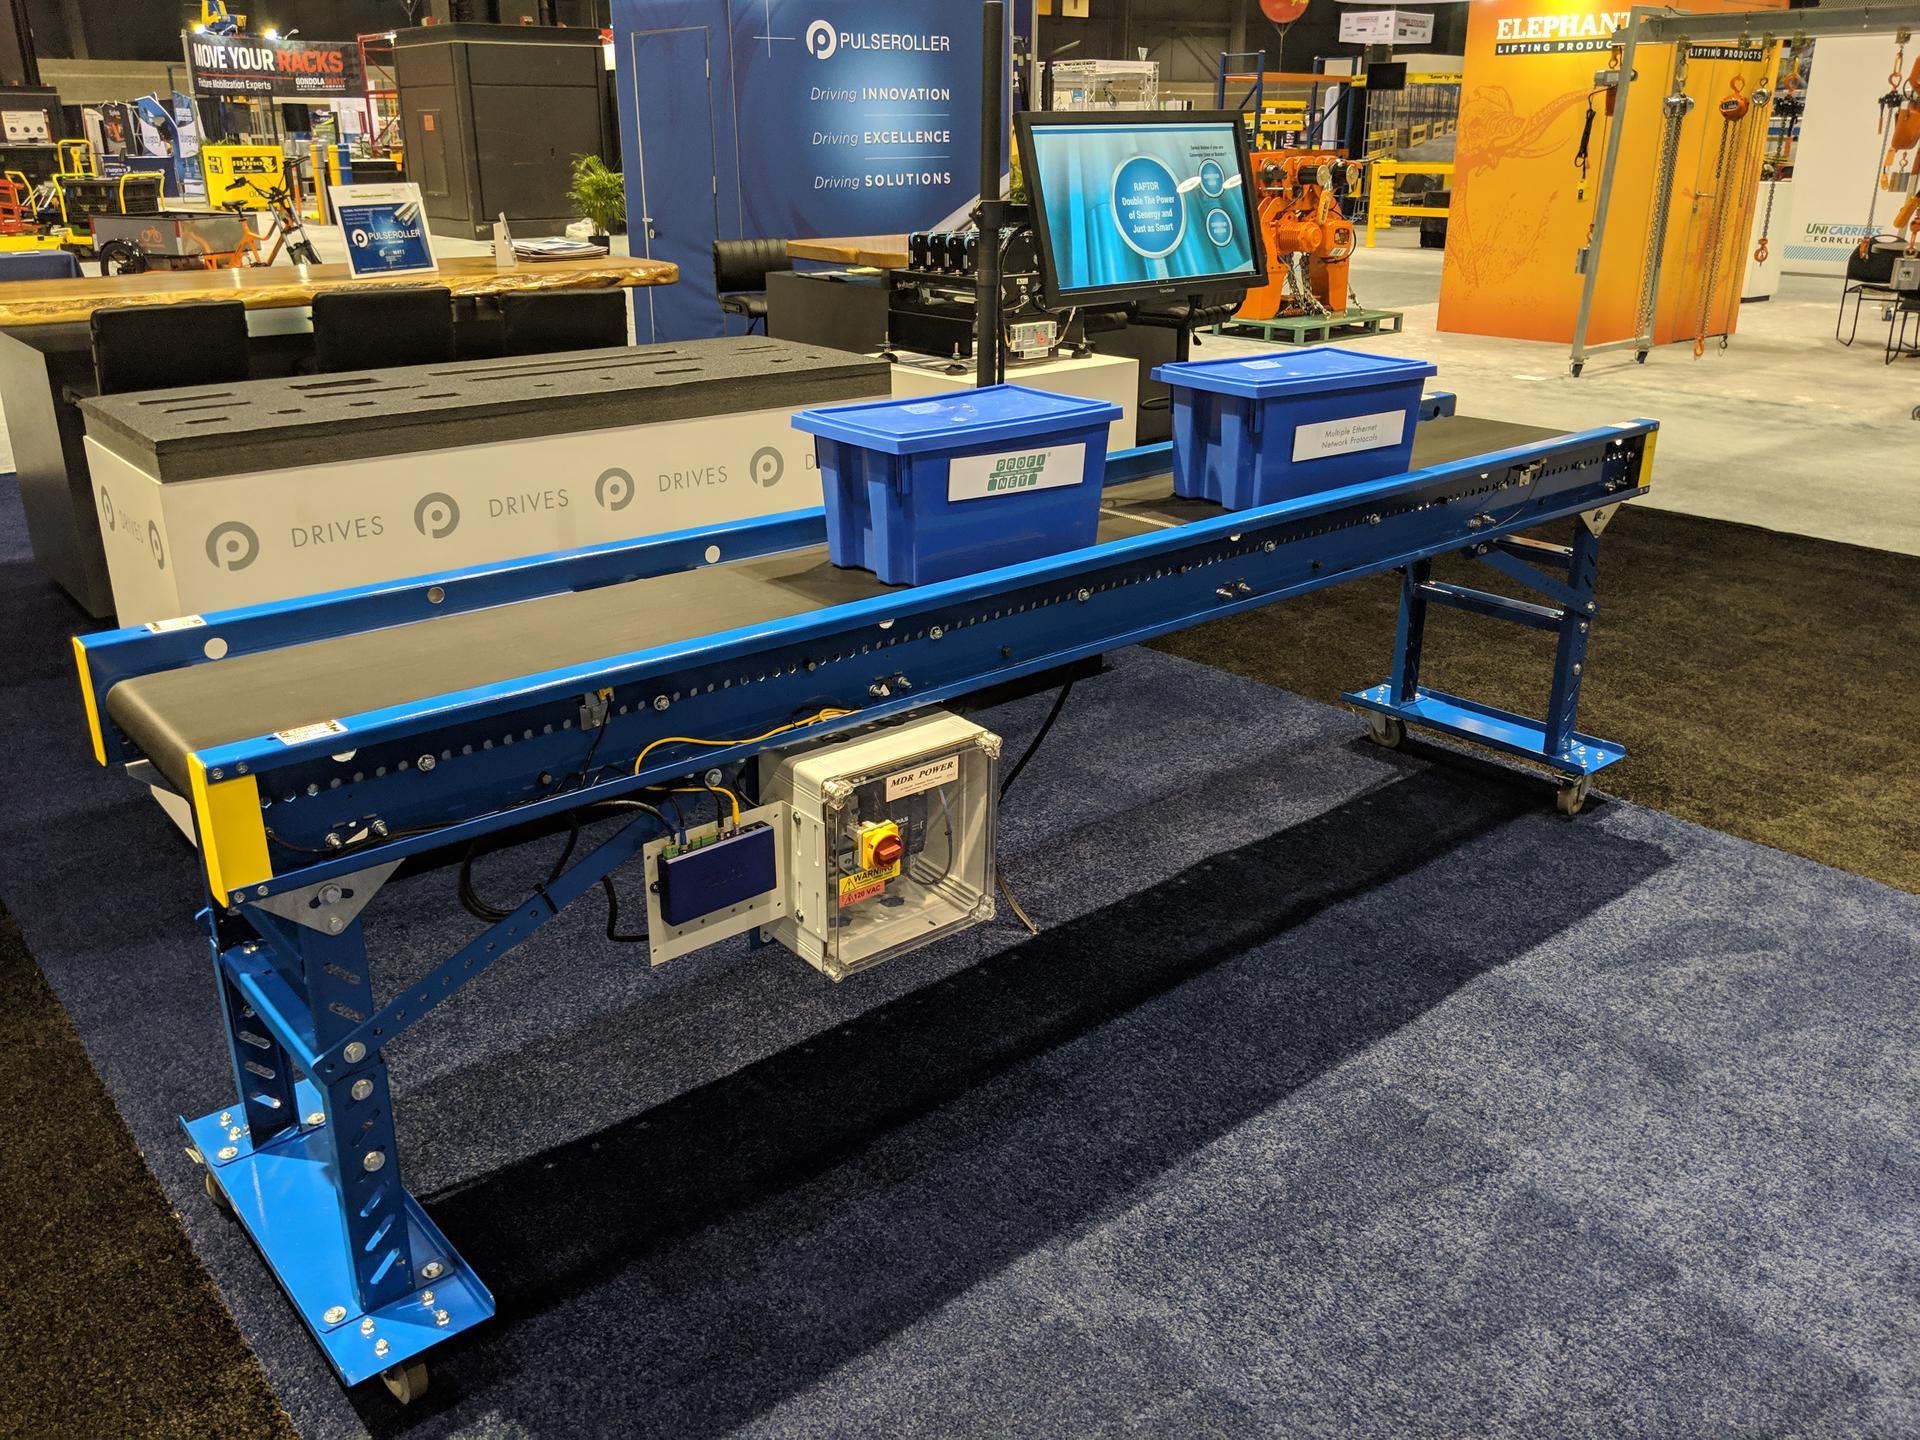 PULSEROLLER Conveyor Systems